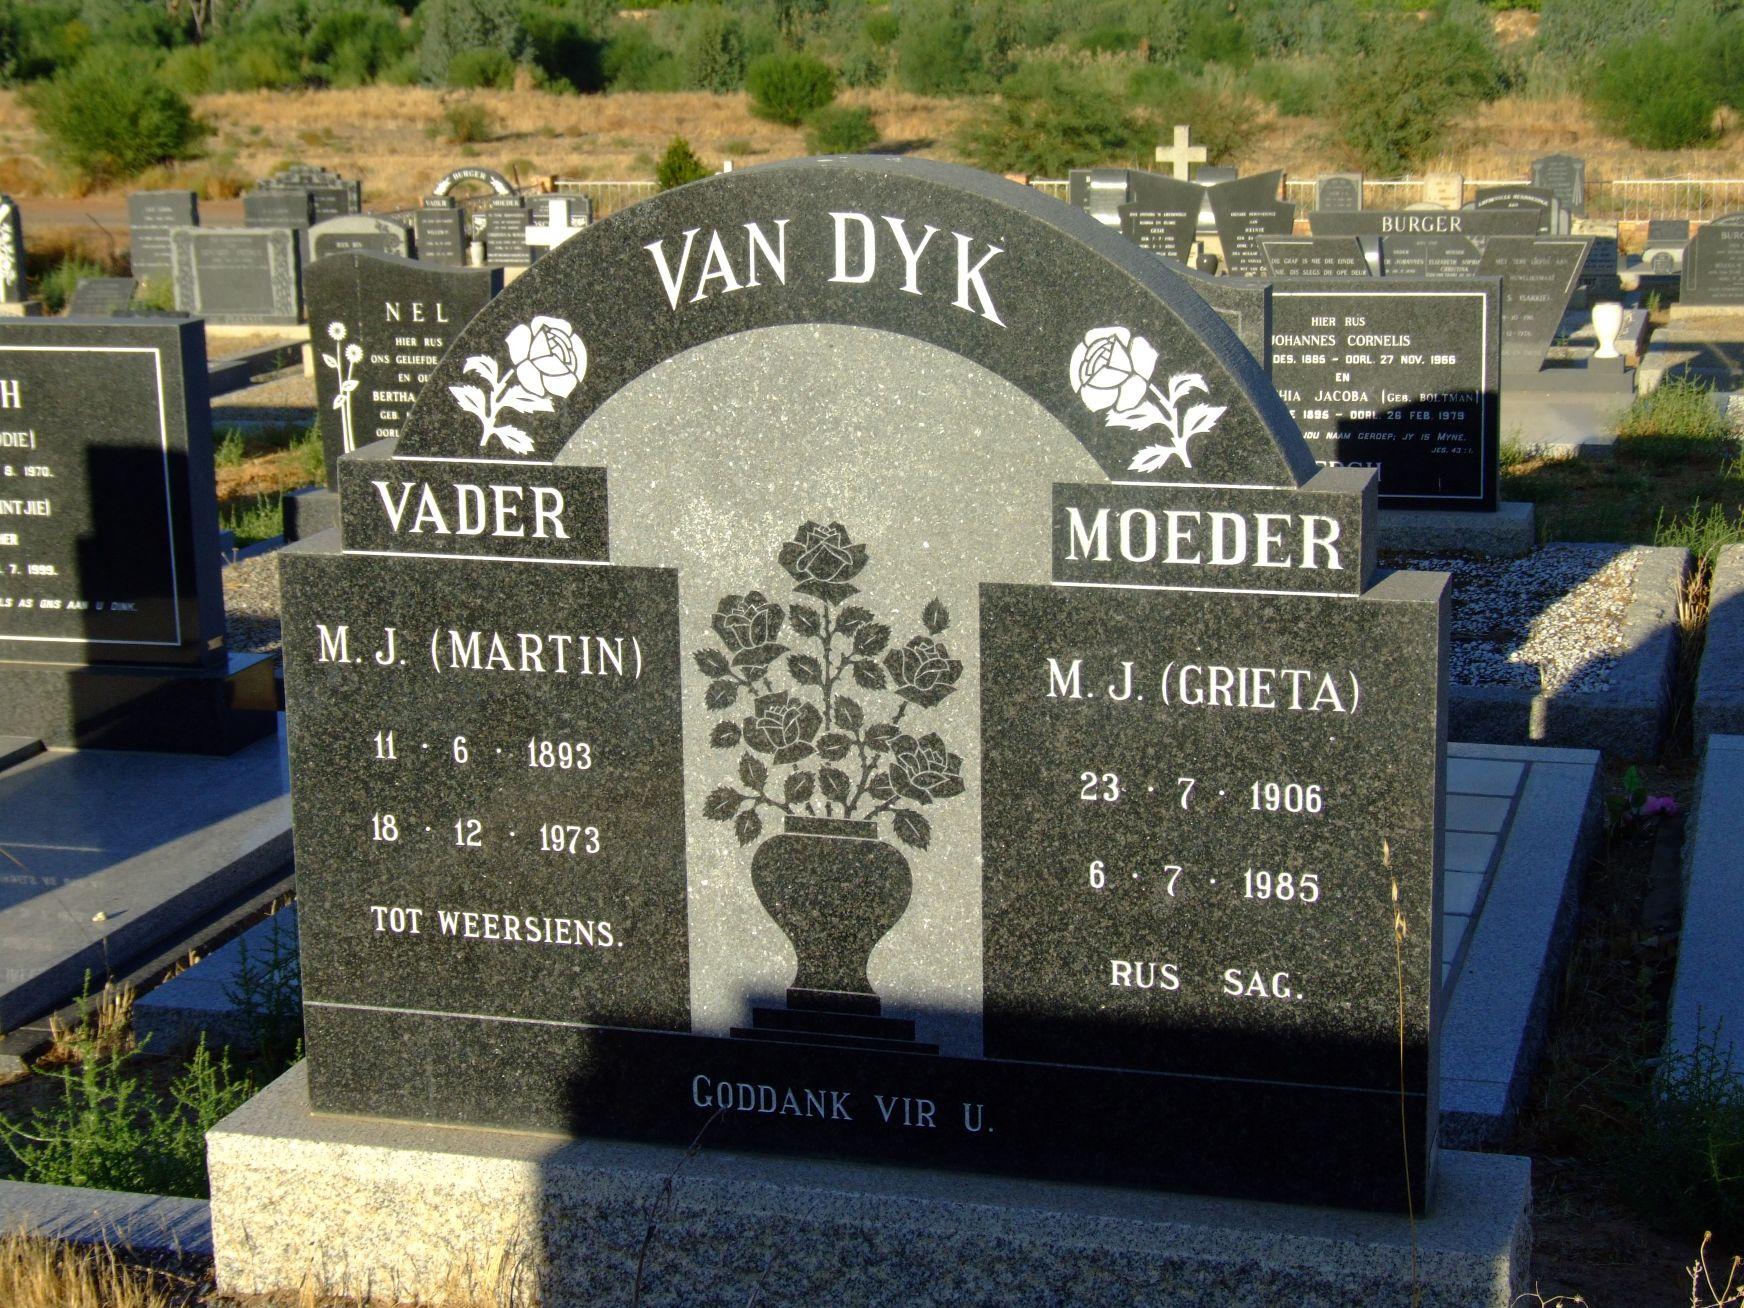 Van Dyk, M.J. (Martin) and Van Dyk, M.J. (Grieta)